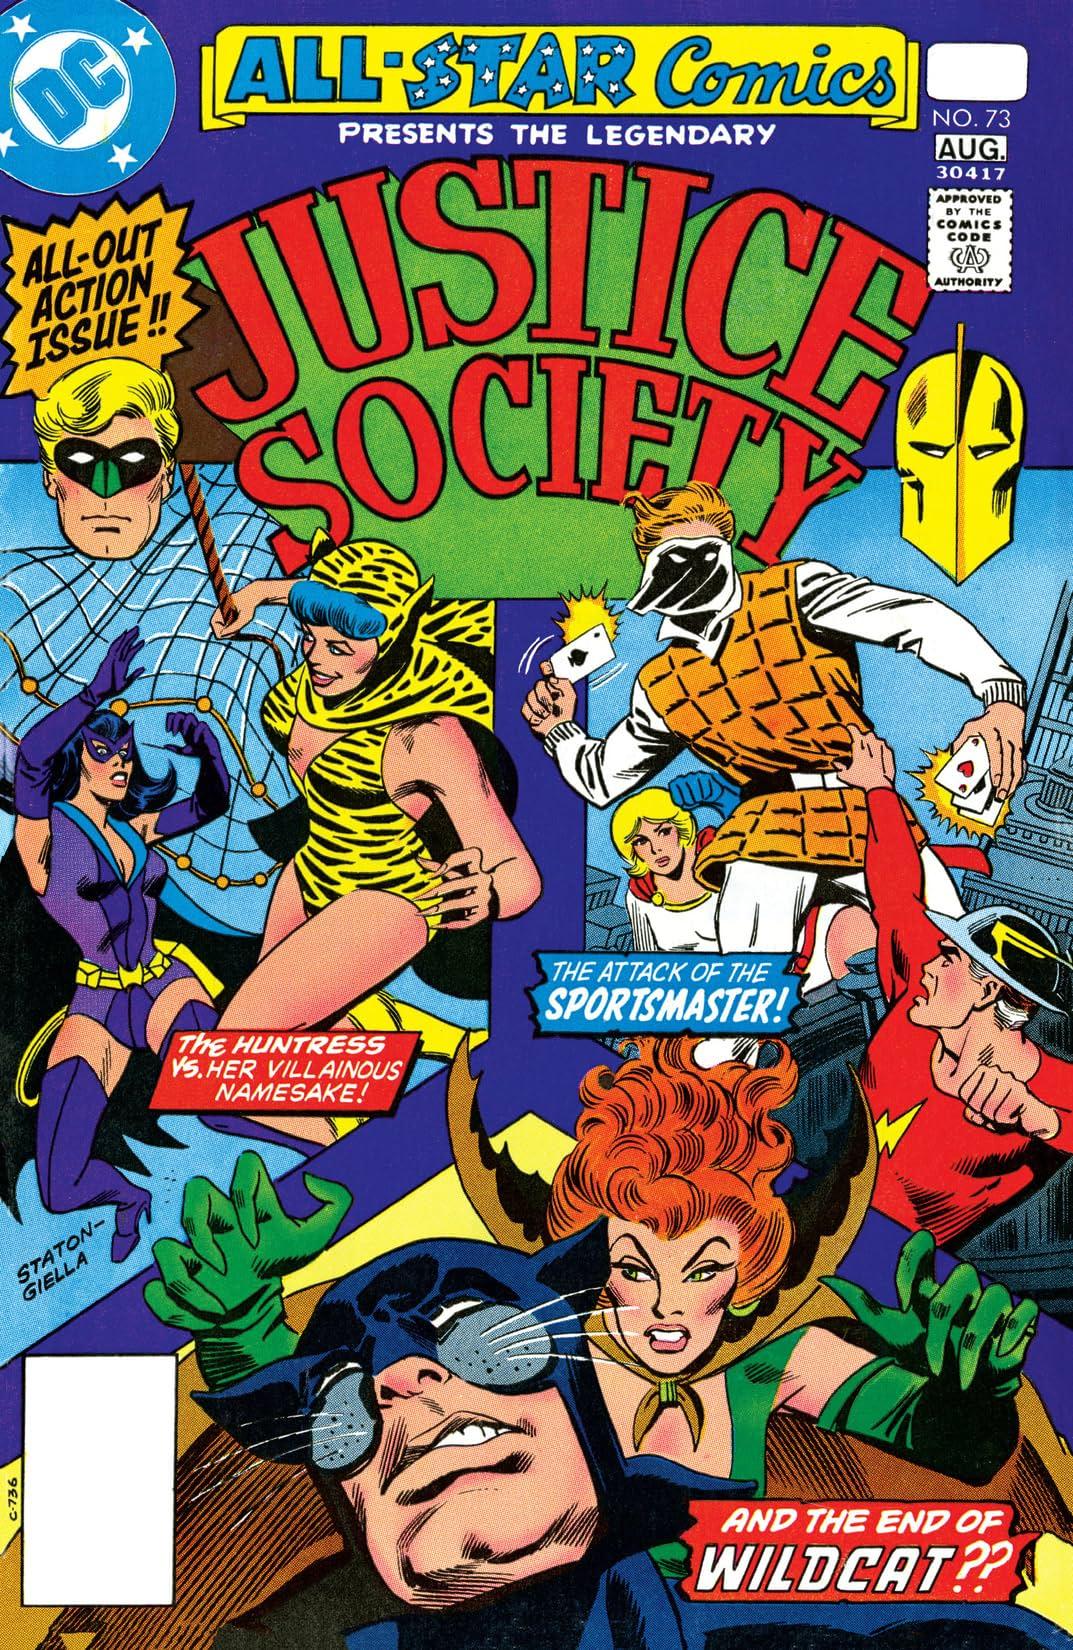 All-Star Comics #73